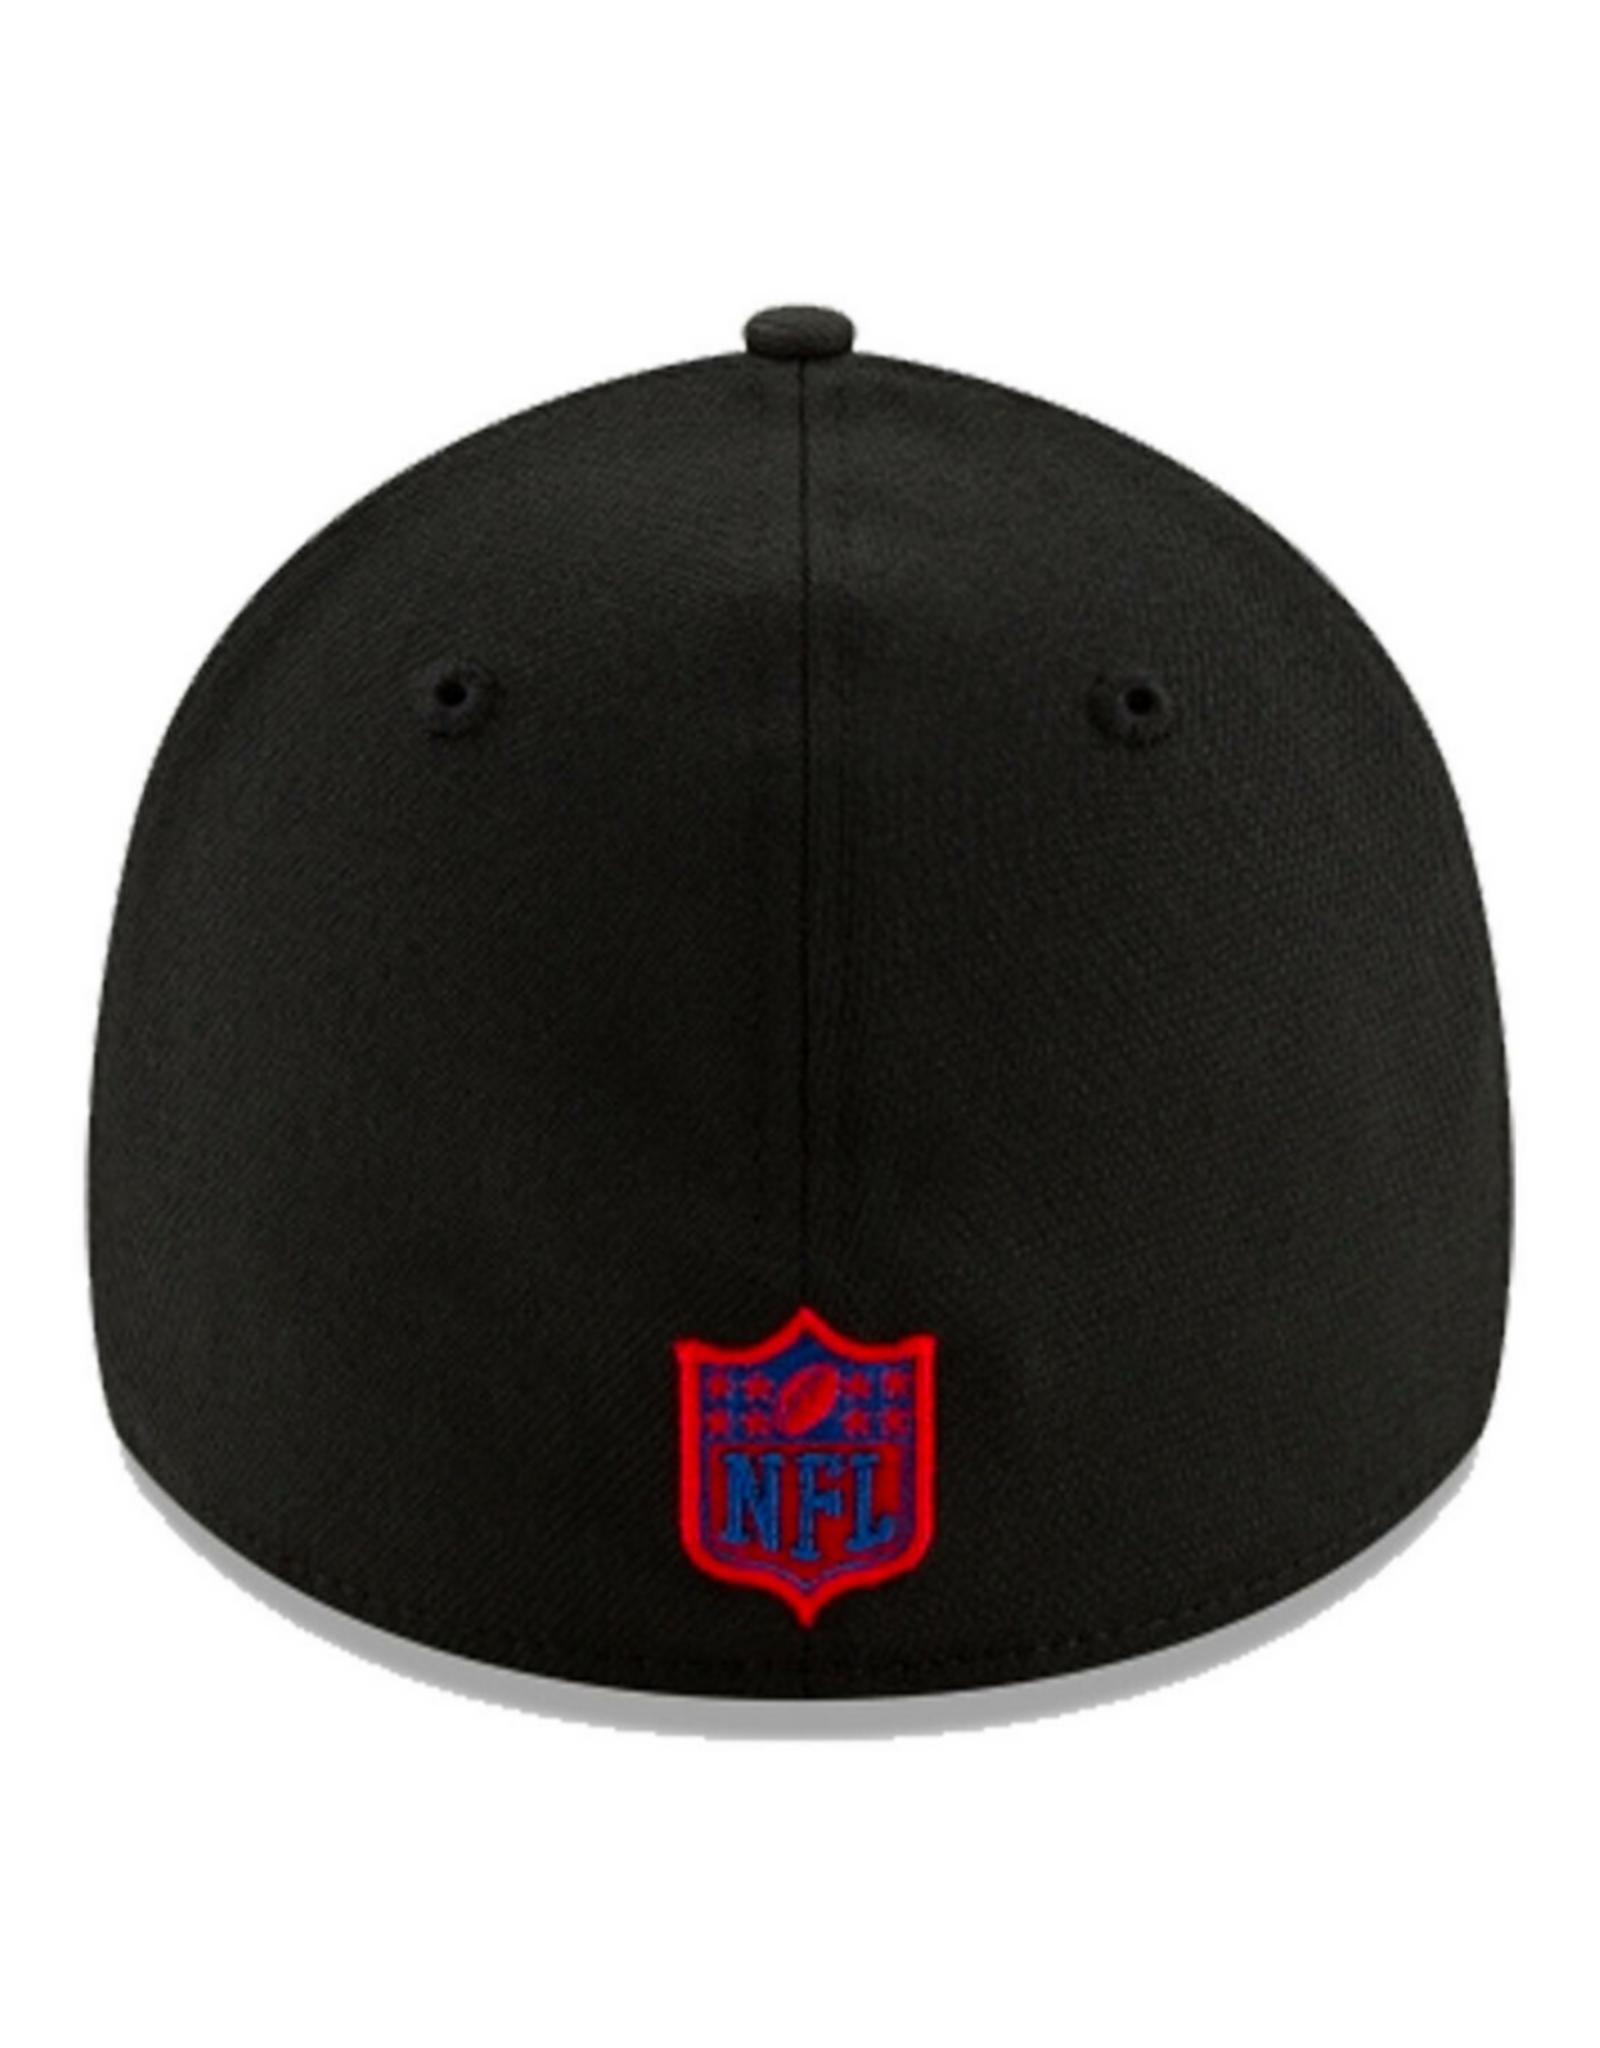 New Era '20 NFL Draft Men's 39THIRTY Hat Buffalo Bills Black